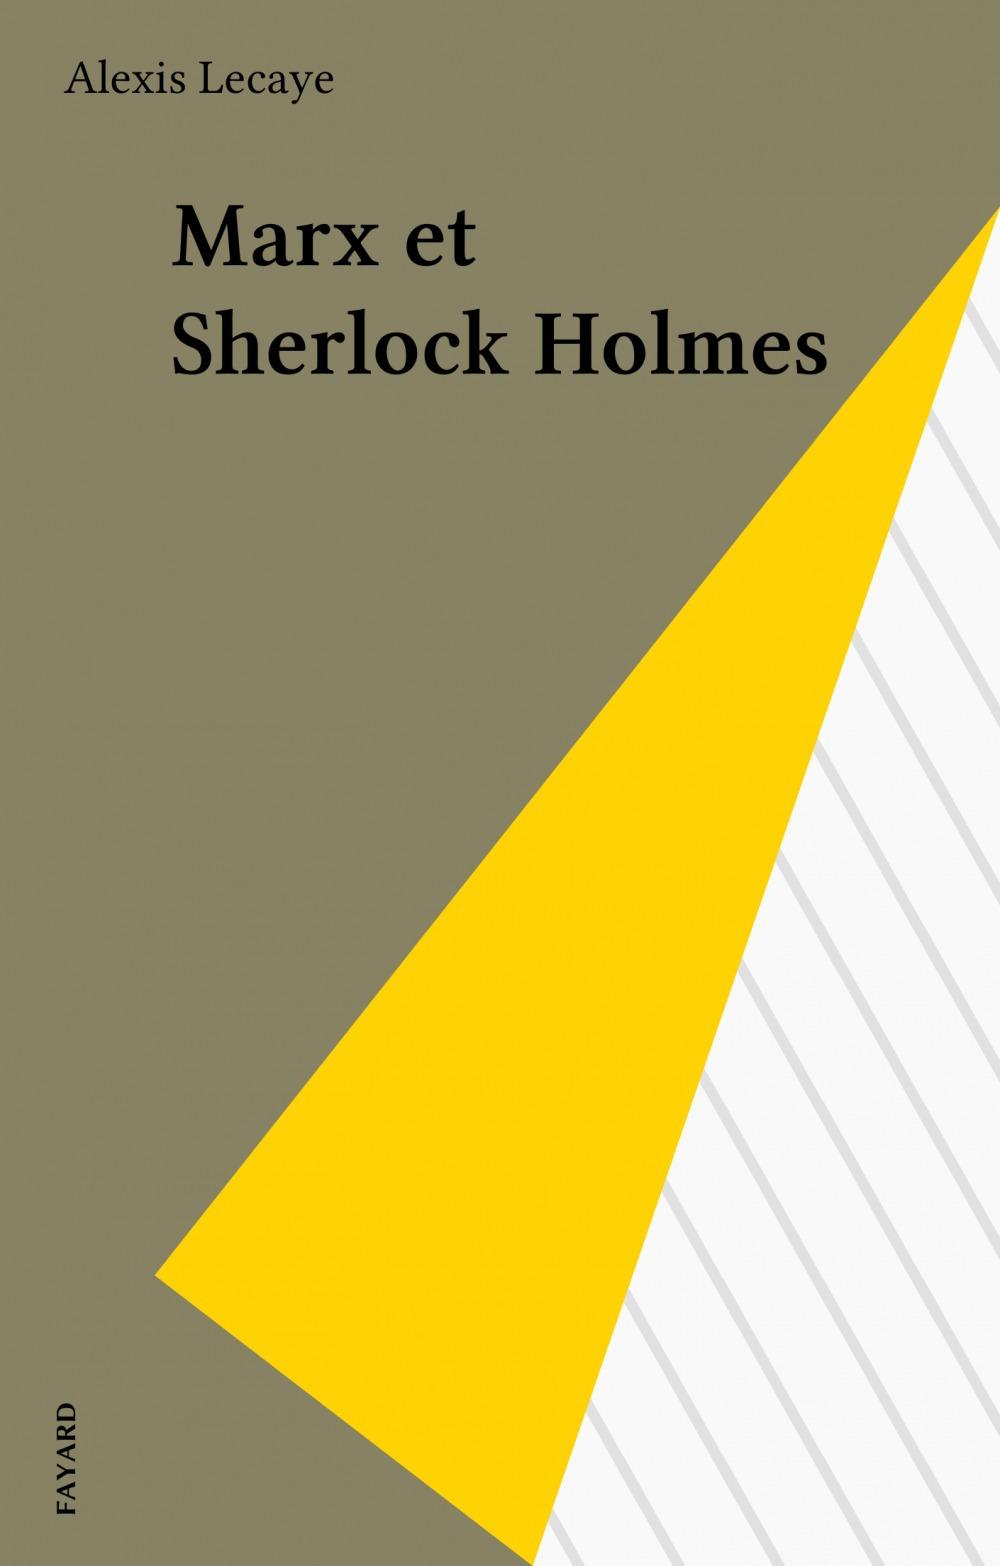 Marx & sherlock holmes